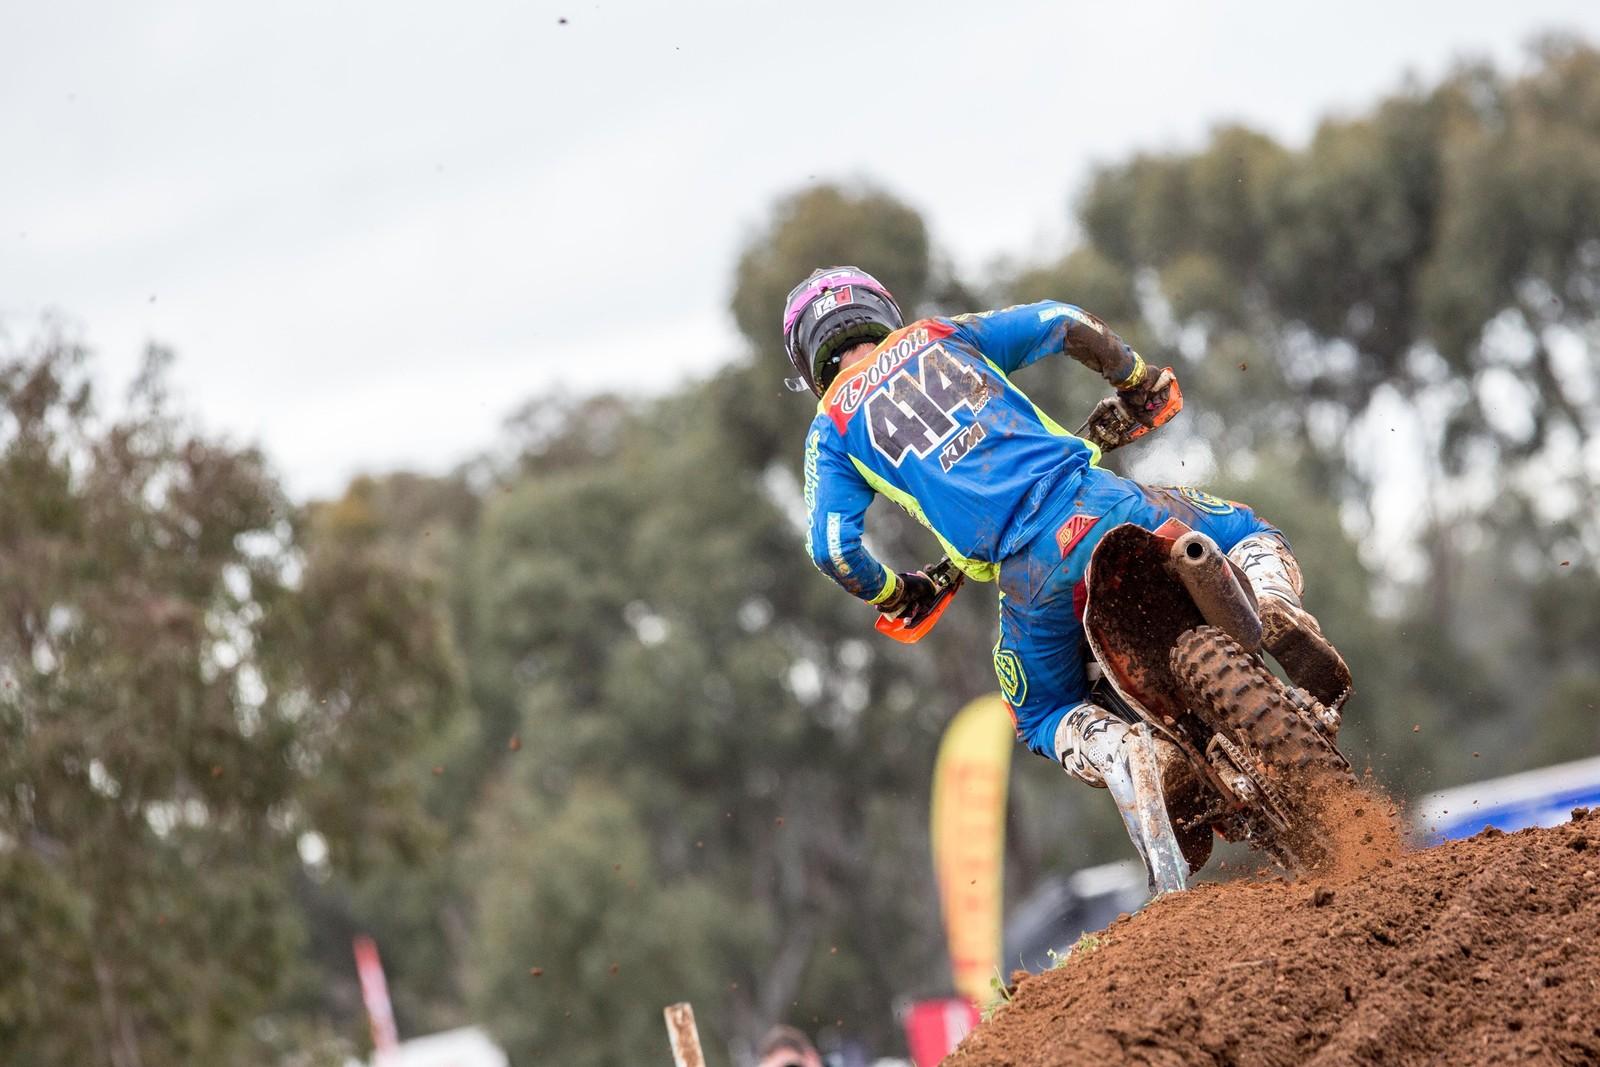 Jesse Dobson - Australian Motul MX Championships: Round 8, Shepparton - Motocross Pictures - Vital MX